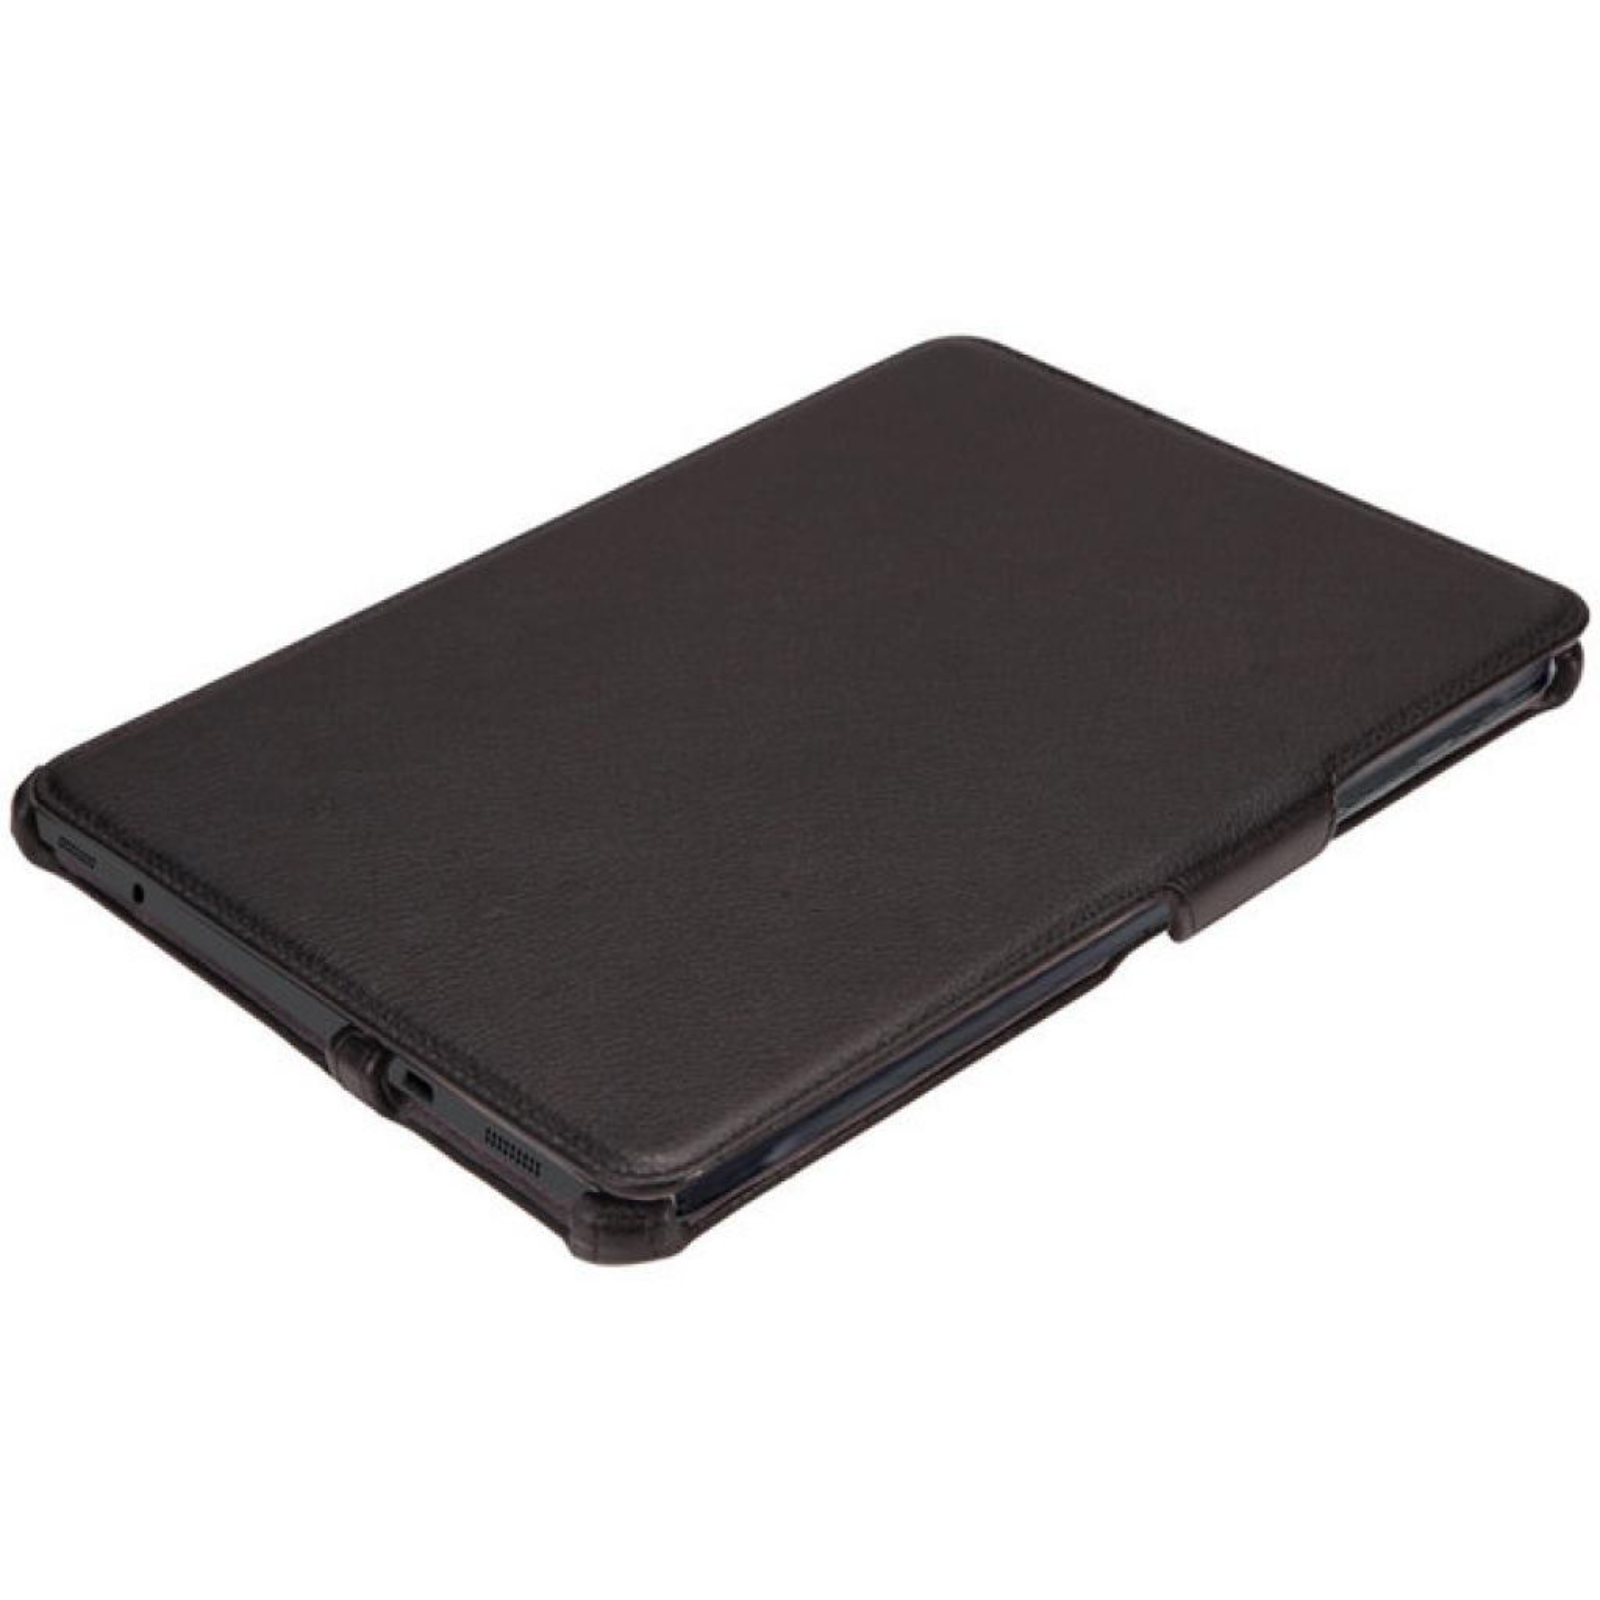 Чехол для планшета AirOn для Samsung Galaxy Tab S 2 8.0 black (4822352777418) изображение 3